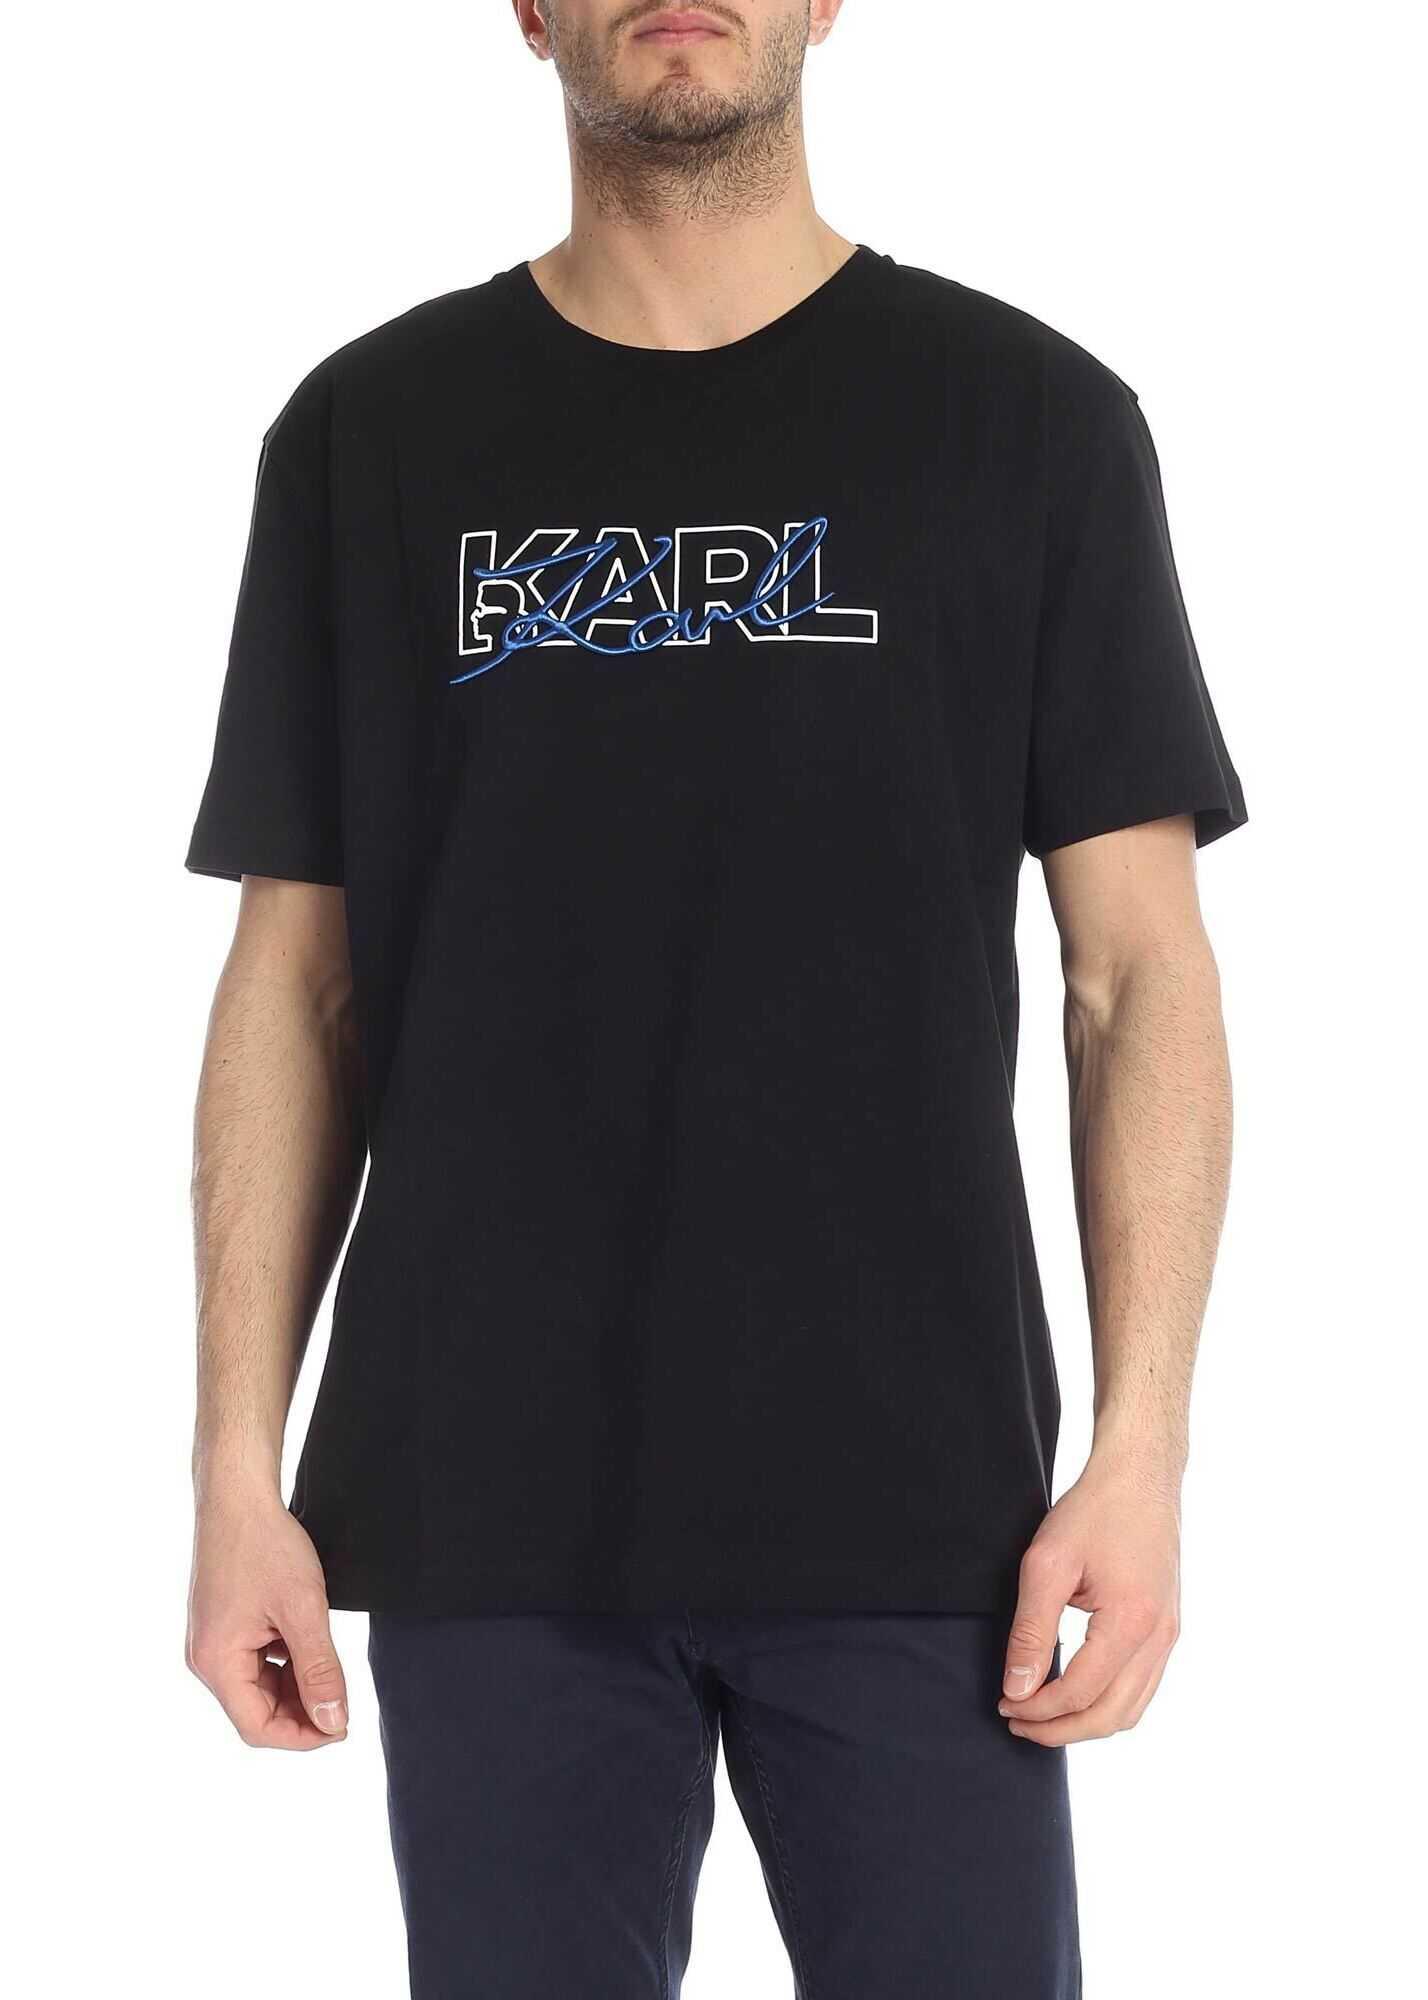 Karl Lagerfeld K Signature Black T-Shirt Black